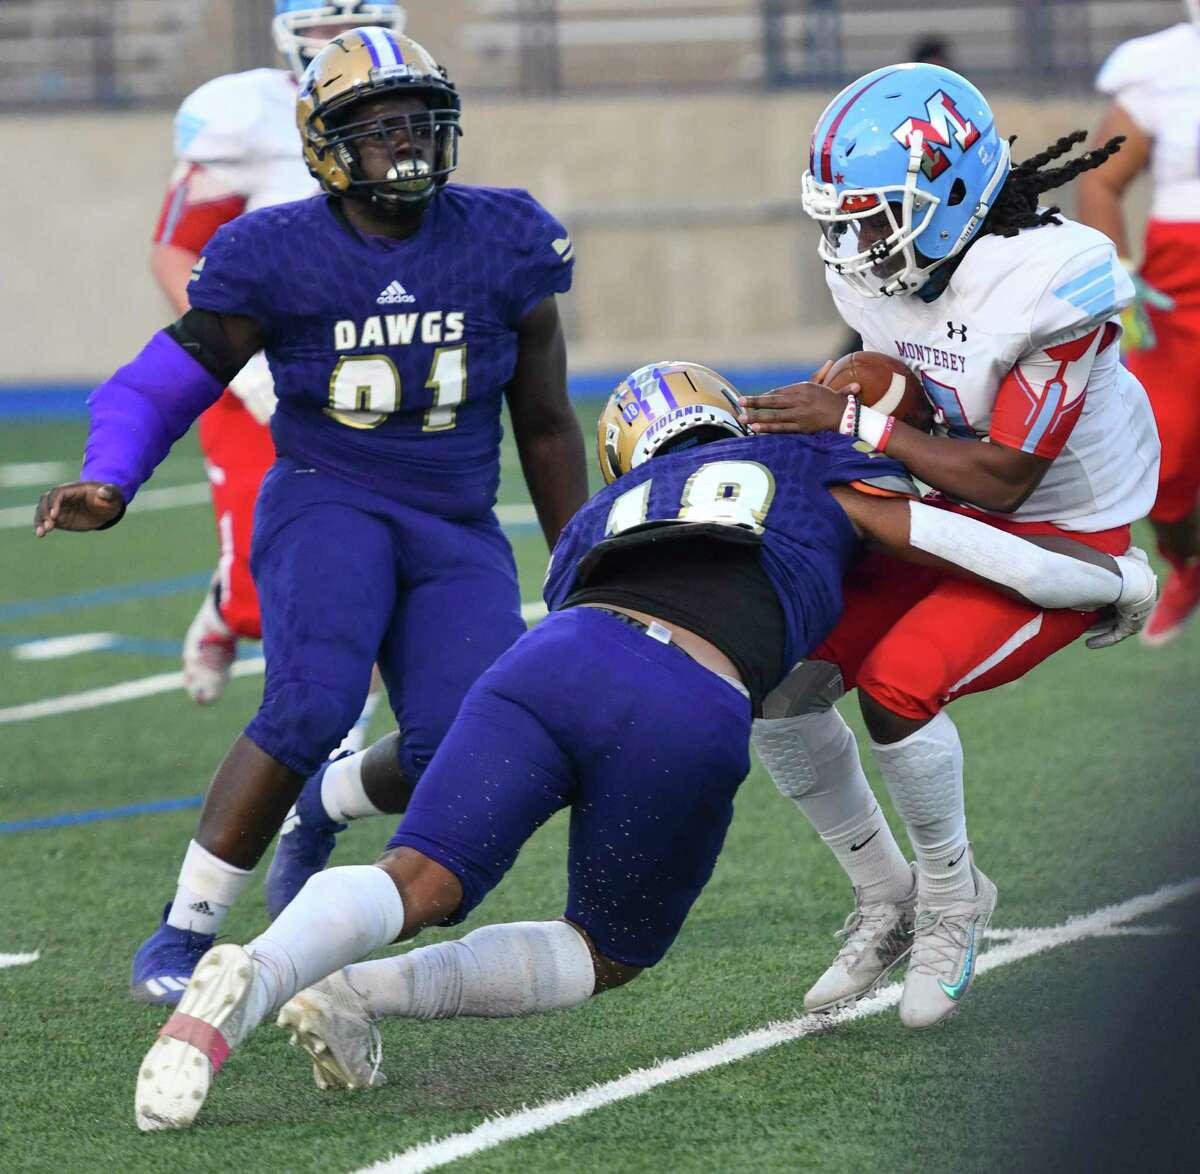 Midland High?•s Matteo Houston tackles Monterey?•s Kyshon Harris on Thursday, Oct. 8, 2020 at Grande Communications Stadium. Jacy Lewis/Reporter-Telegram